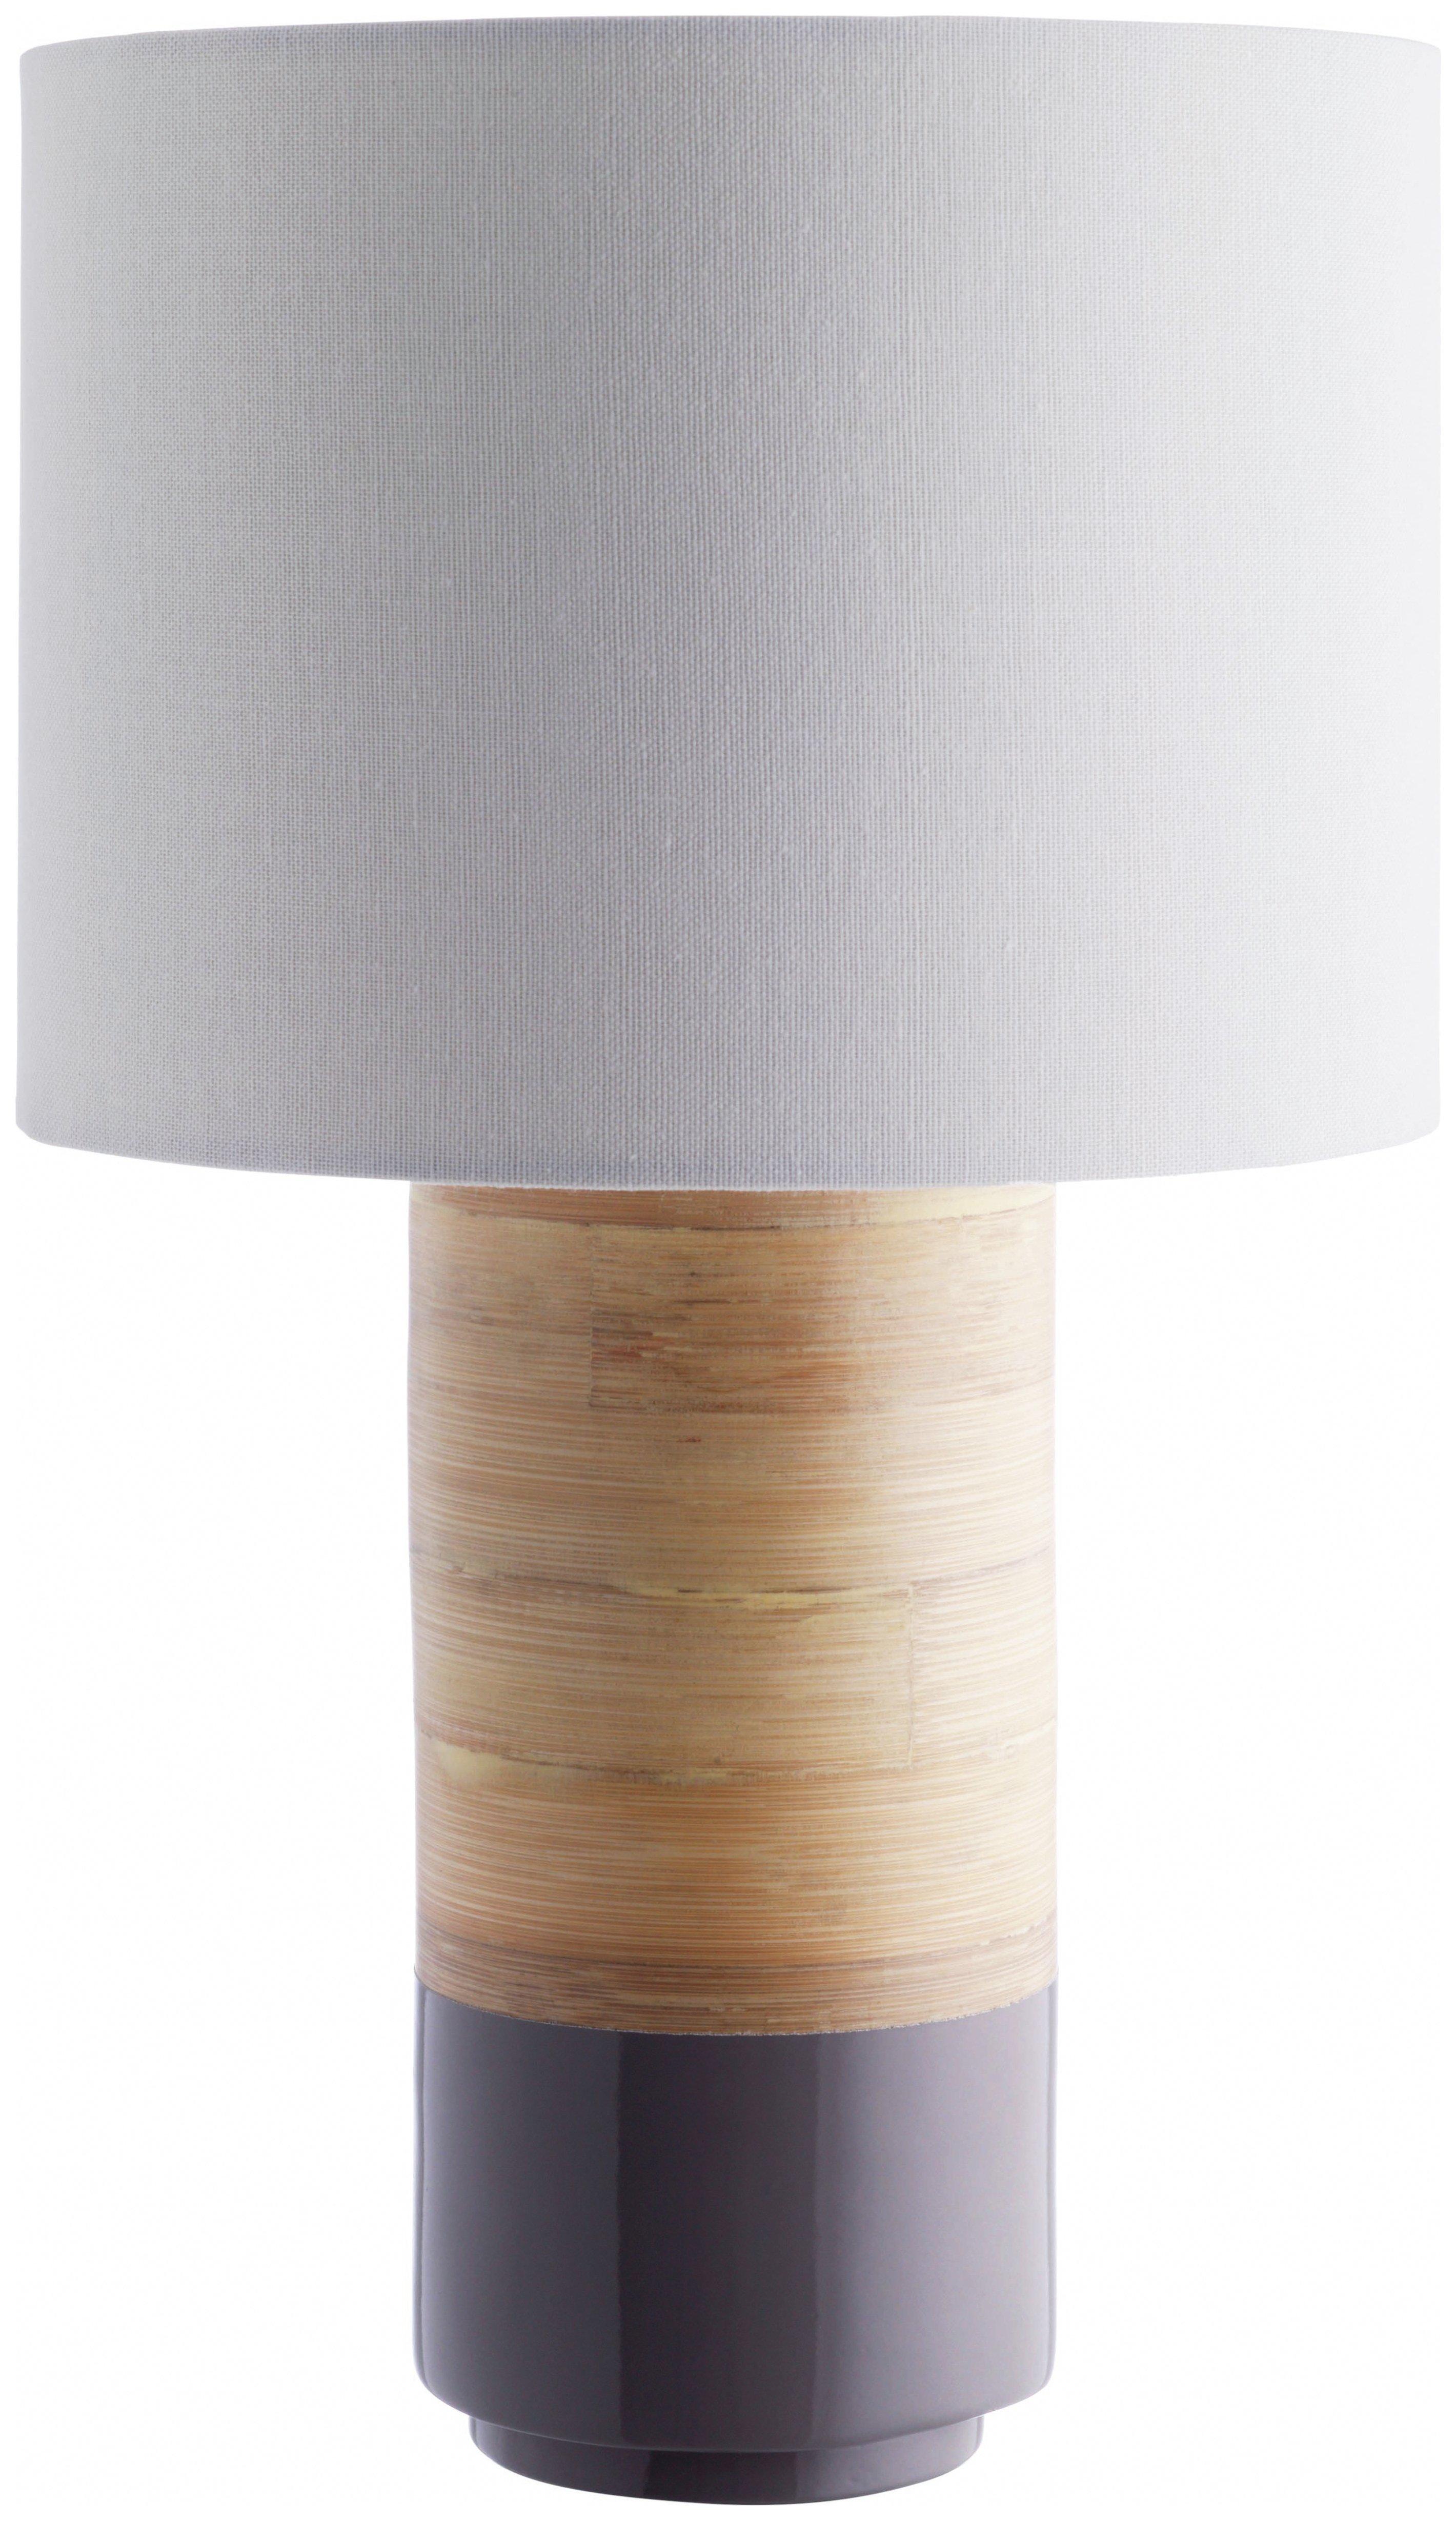 Image of Habitat - Tub Grey Spun Bamboo - Table Lamp